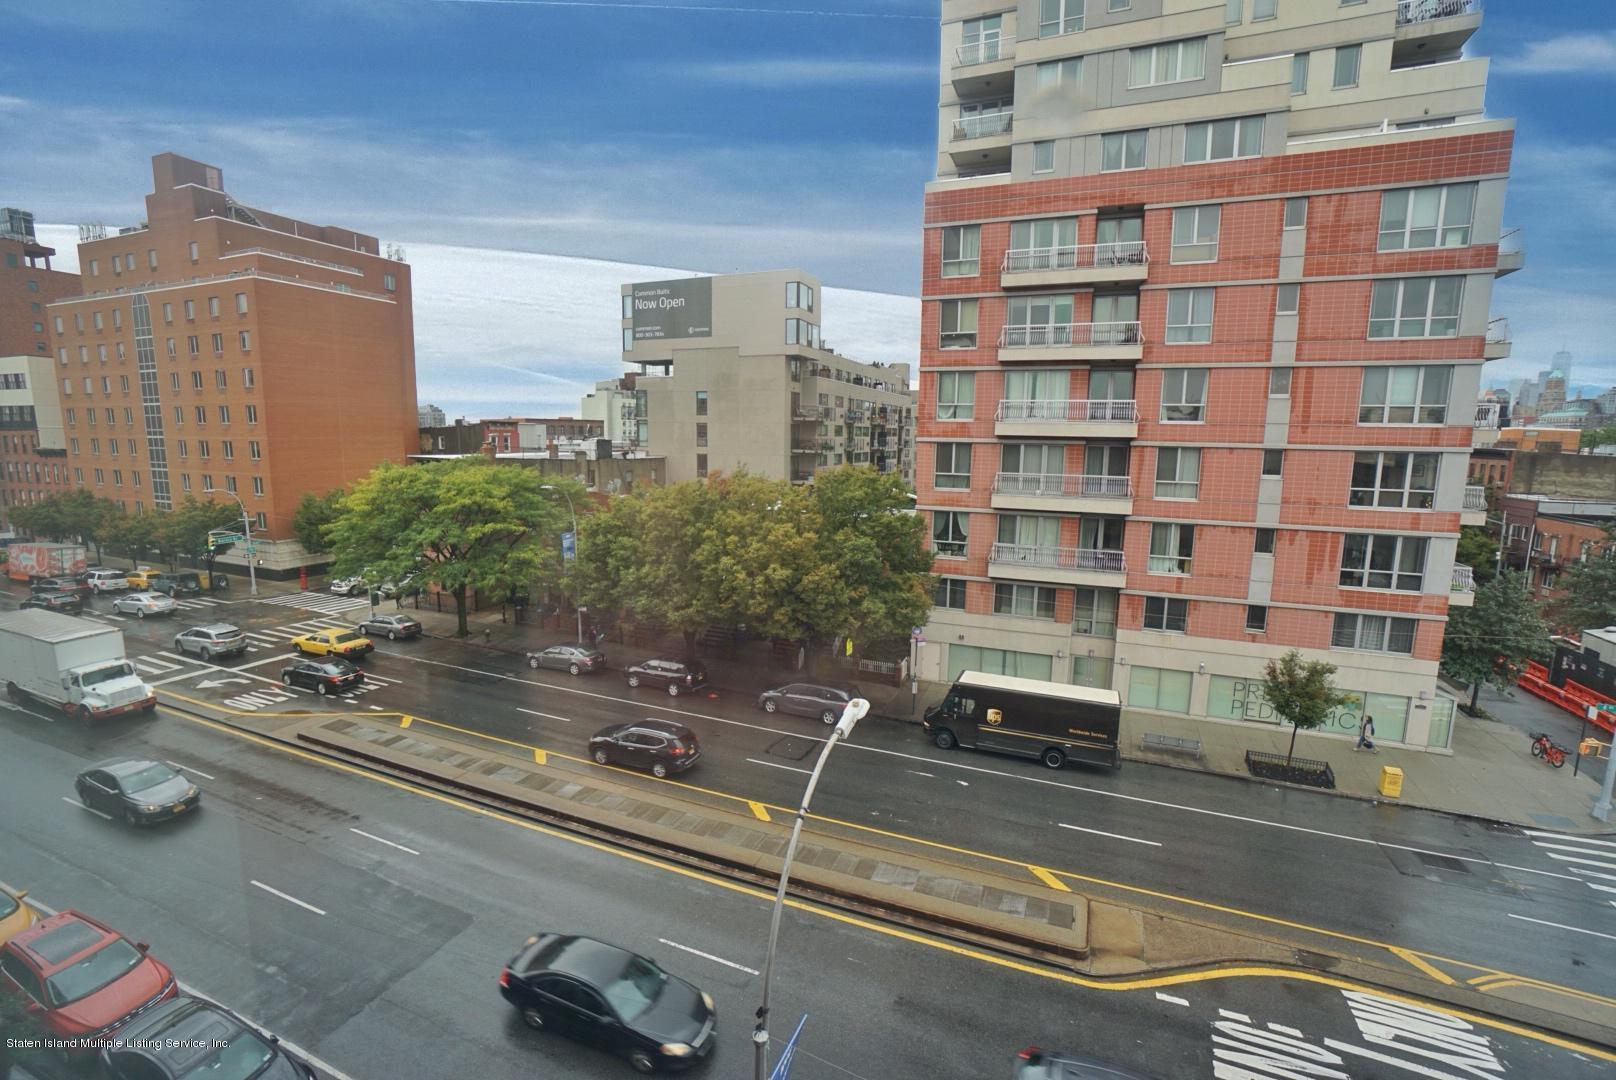 4l 103 4 Avenue,Brooklyn,New York,11217,United States,1 Bedroom Bedrooms,3 Rooms Rooms,1 BathroomBathrooms,Residential,4,1132924